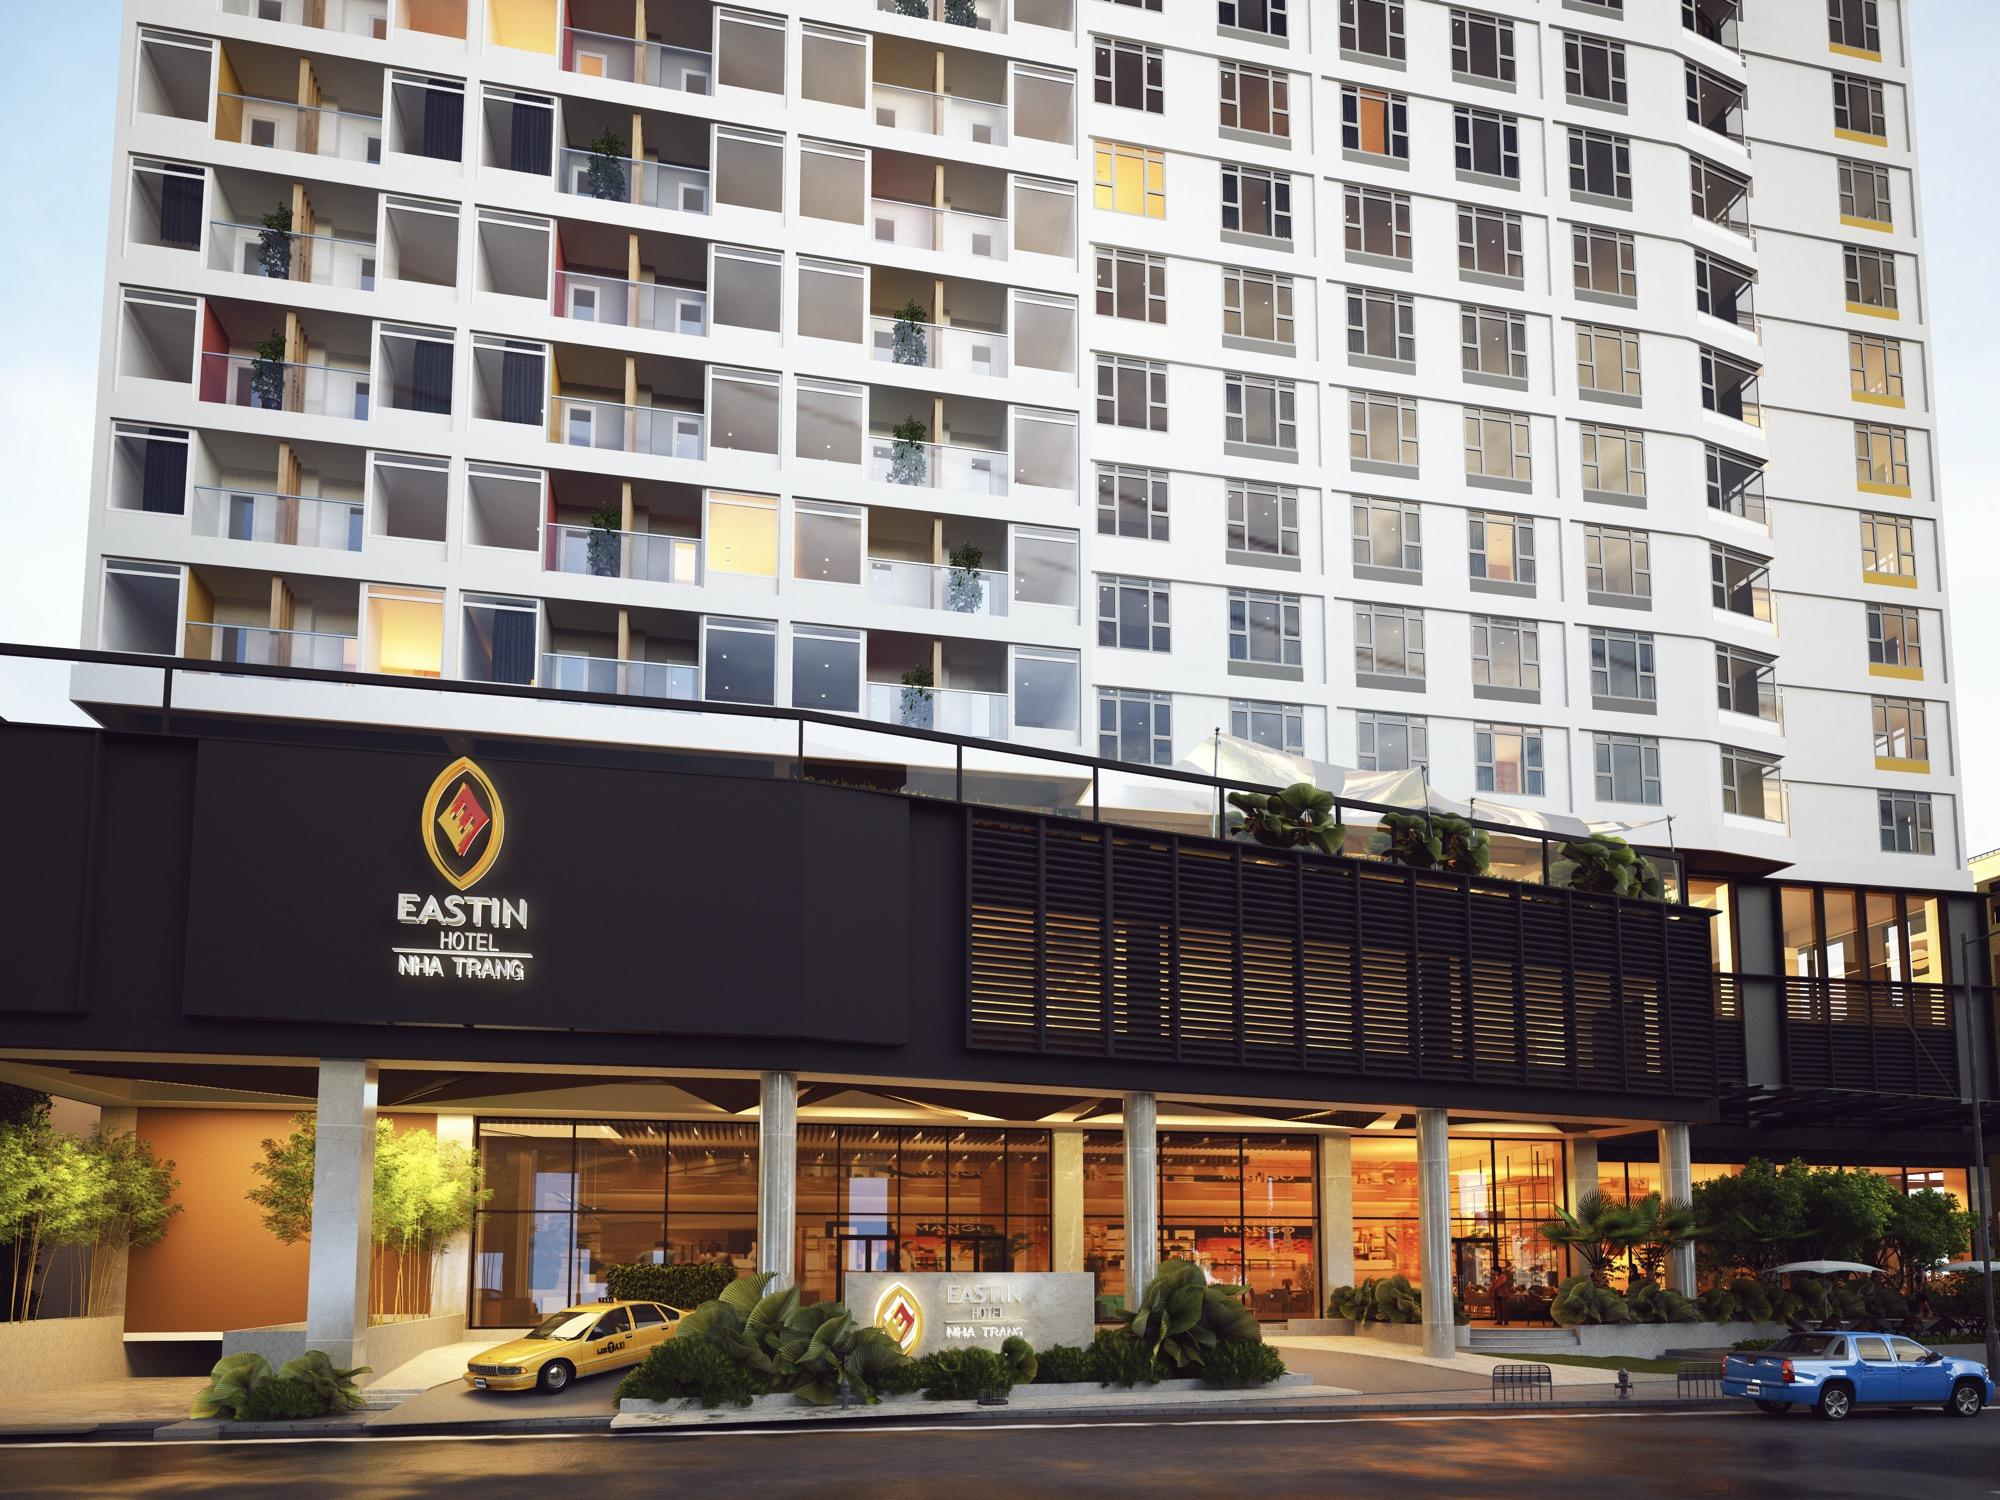 Eastin Hotel Nha Trang Exterior